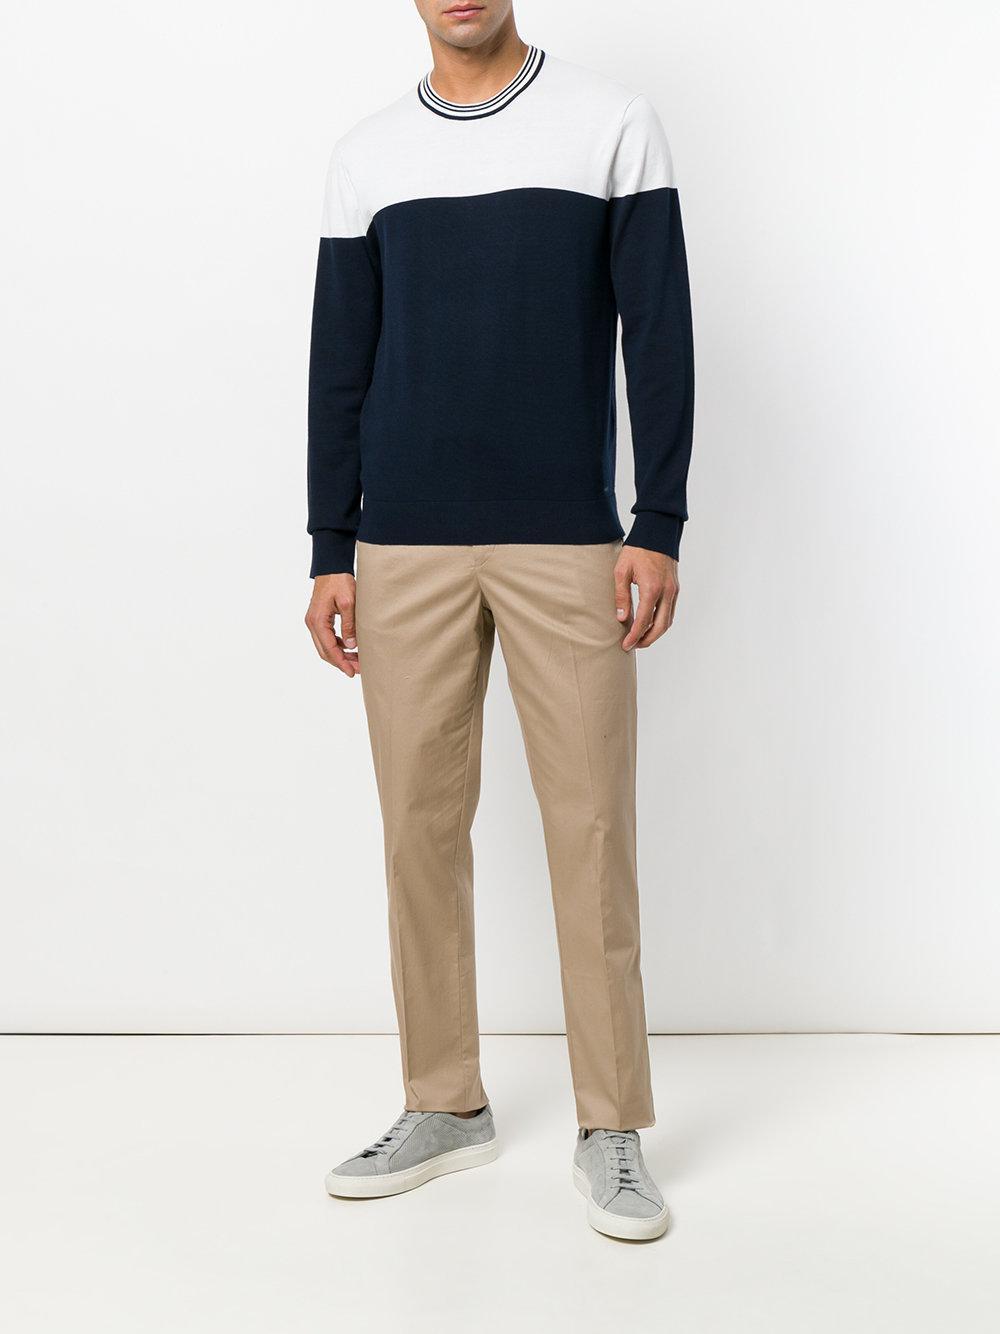 Michael Kors Cotton Straight Leg Trousers in Natural for Men